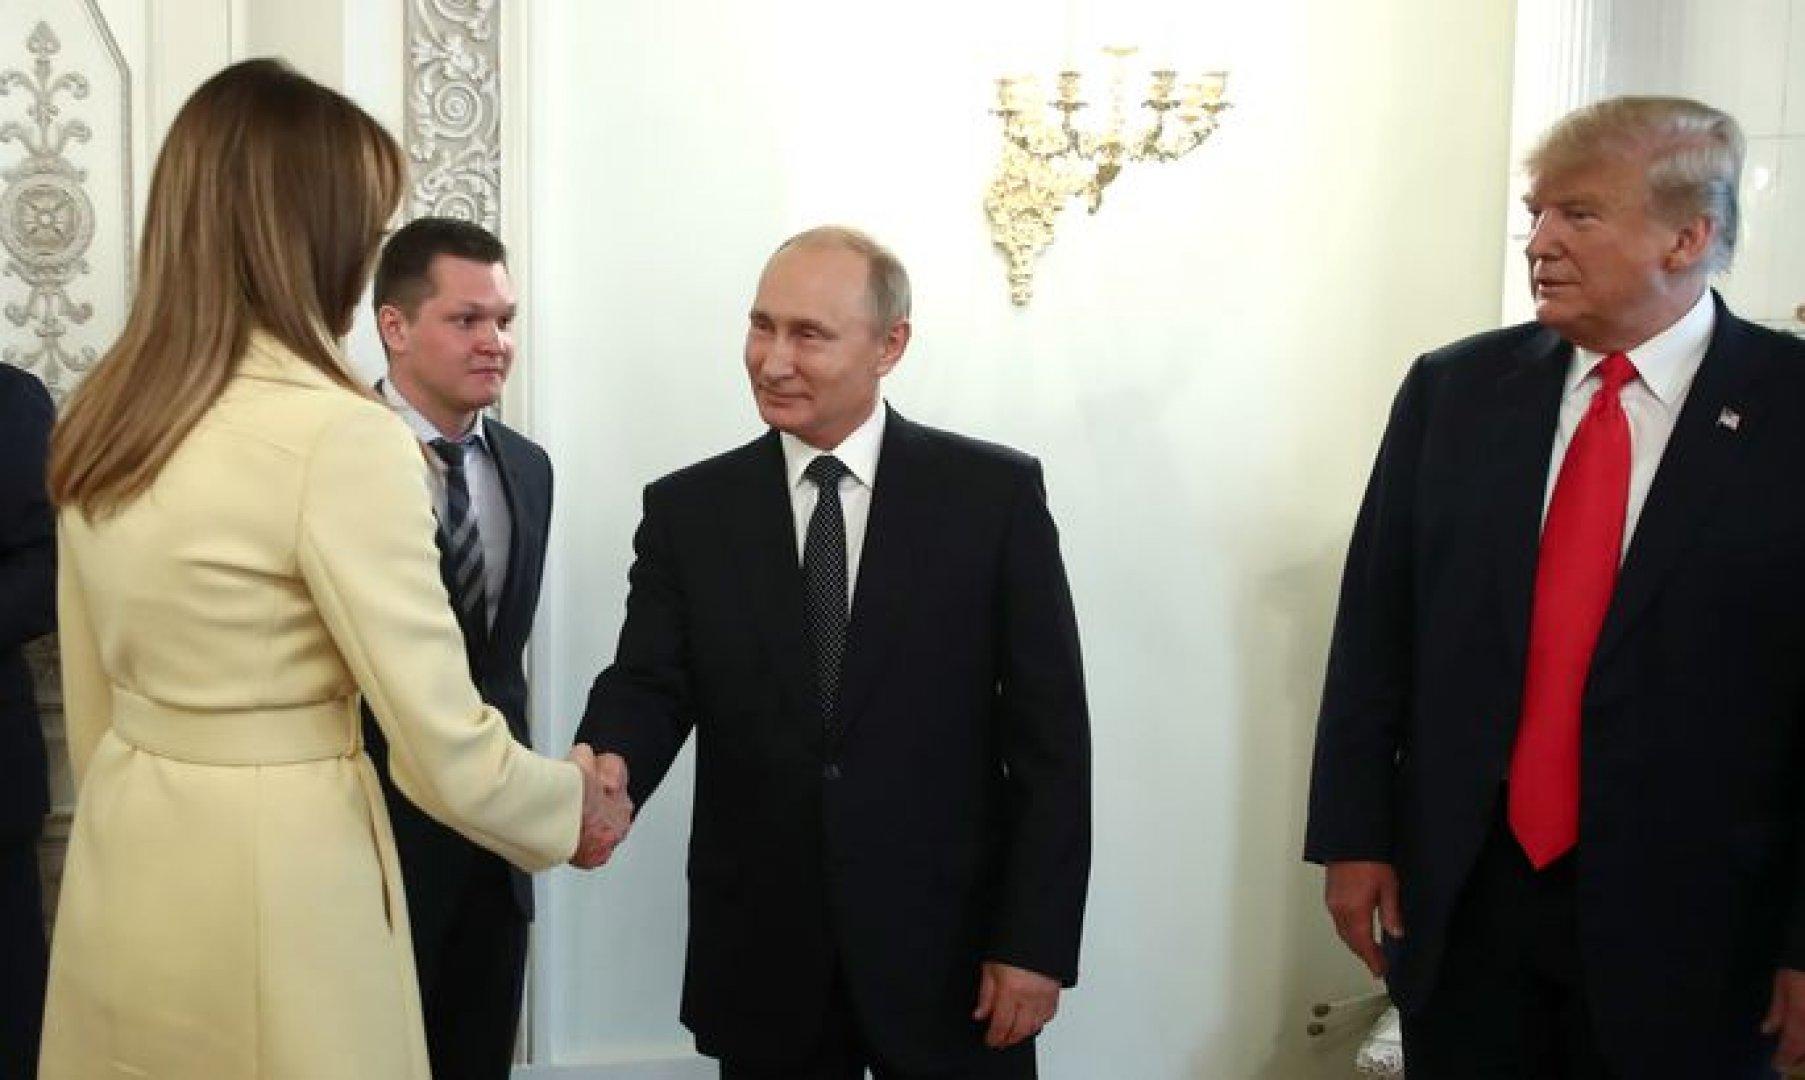 Психолог объяснил испуг жены Трампа после рукопожатия с Путиным